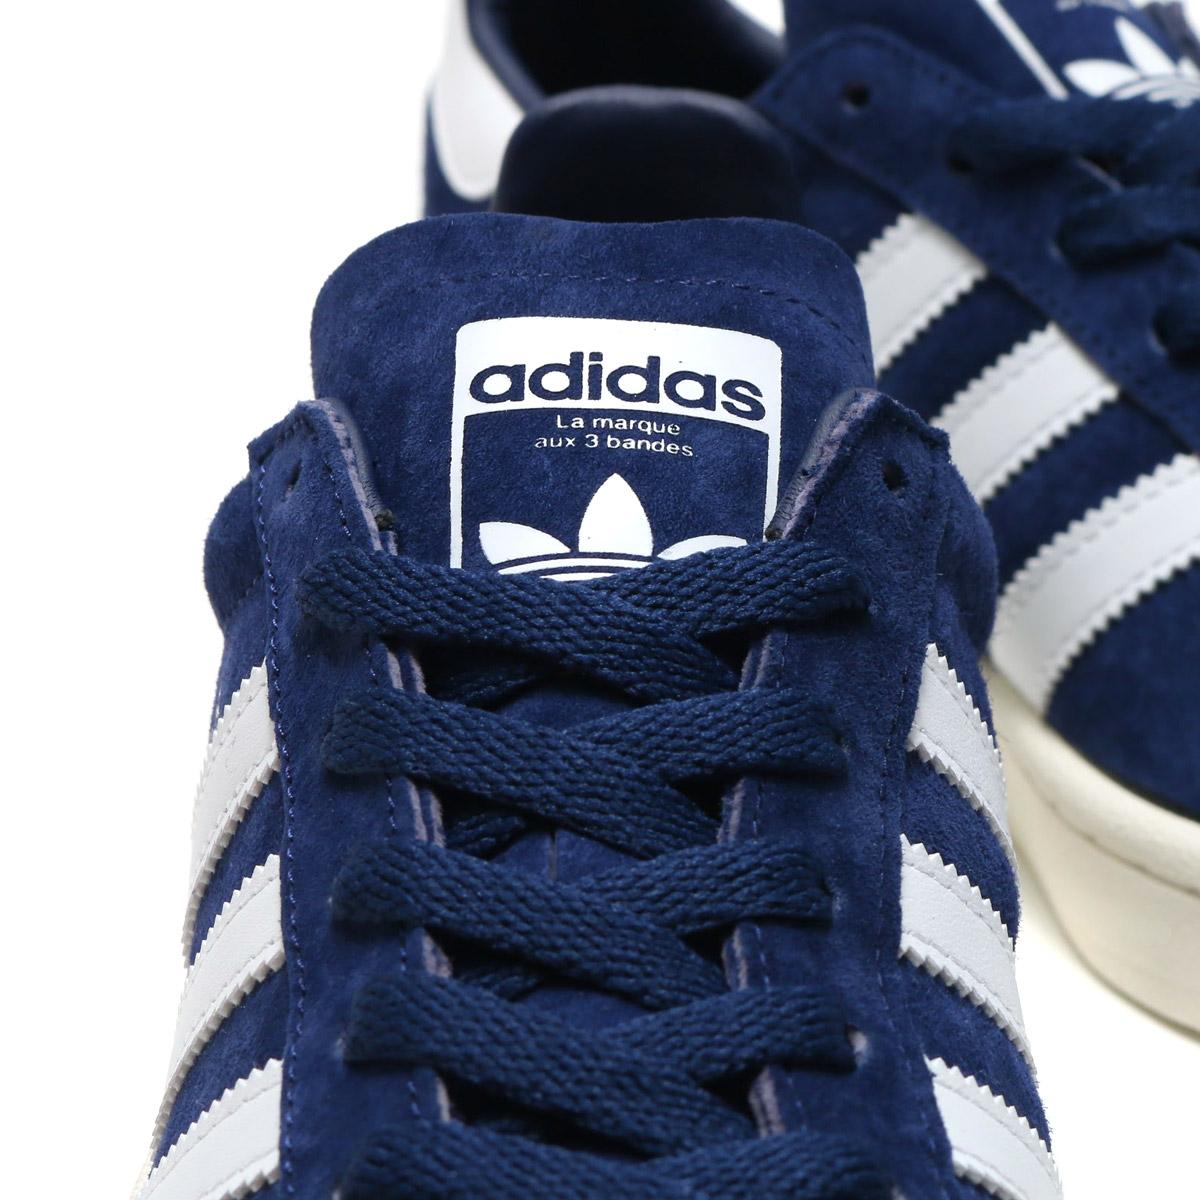 adidas Originals CAMPUS (아디다스오리지나르스캐파스) (Dark Blue/Running White/Chalk White) 17 FW-I